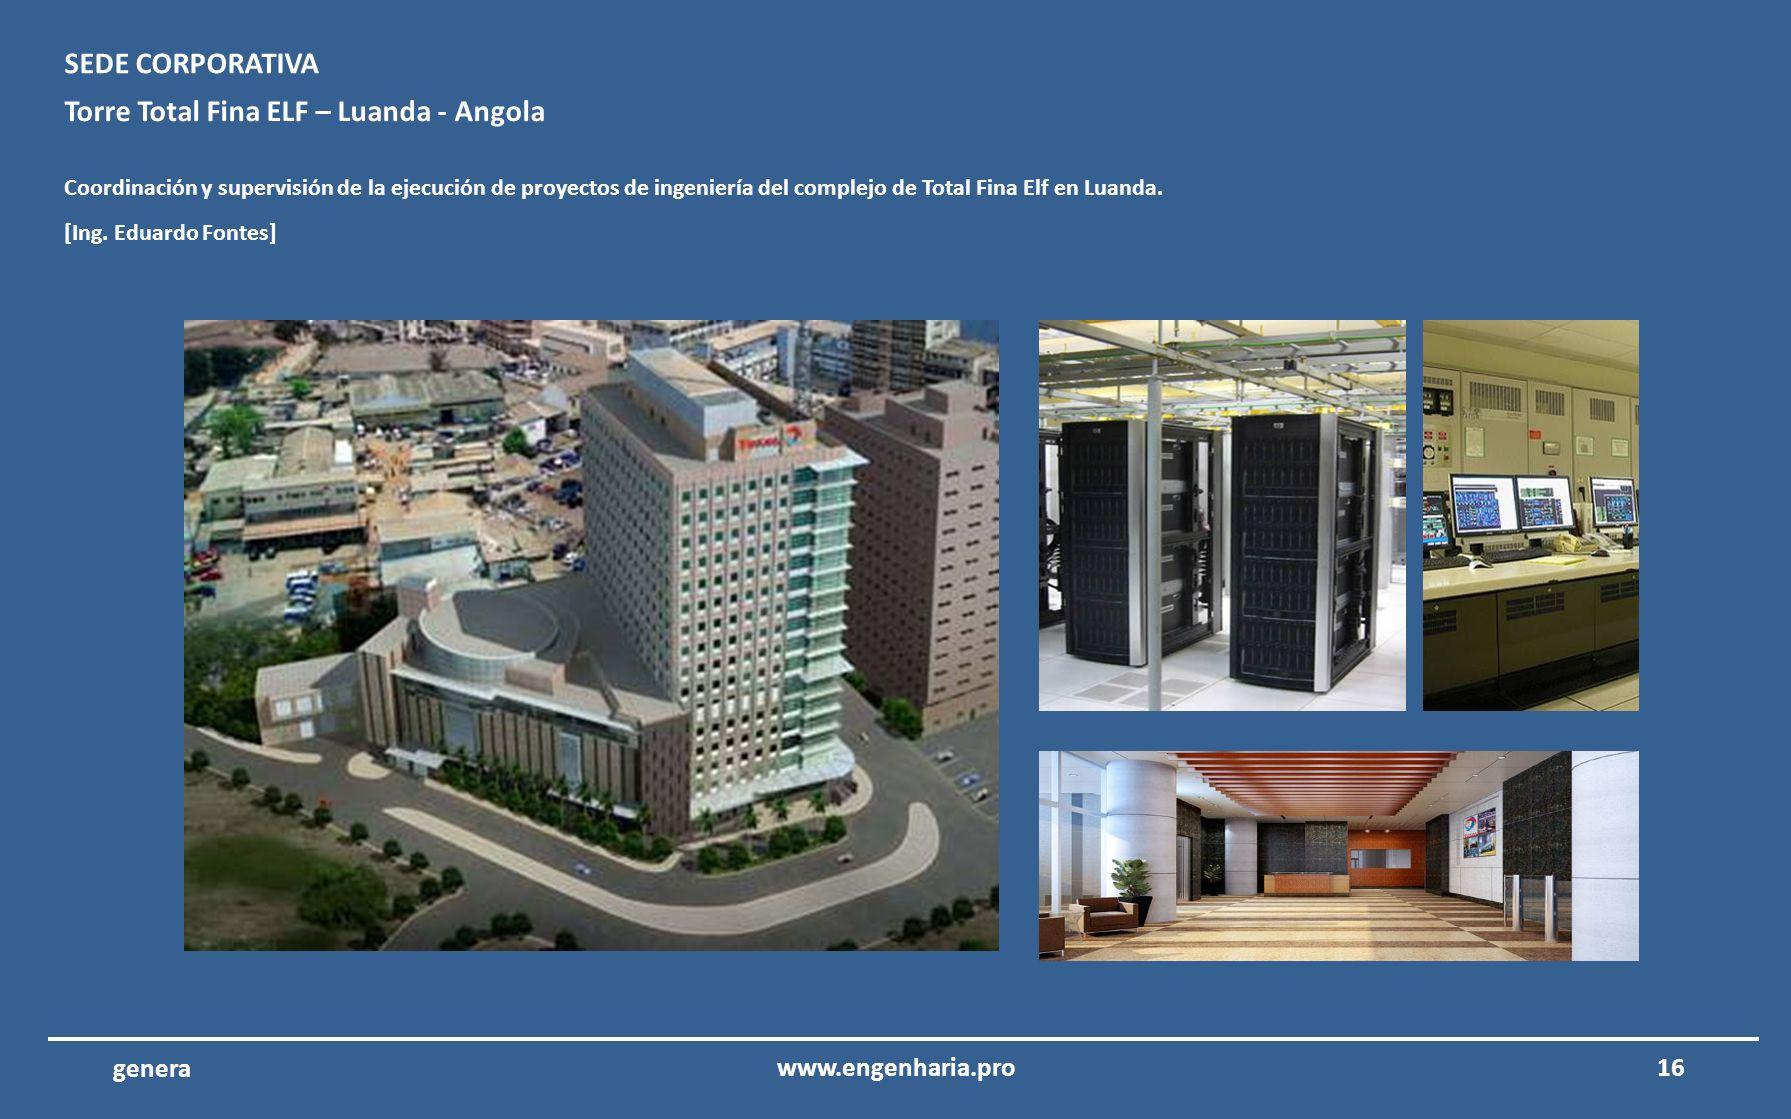 Torre Total Fina ELF – Luanda - Angola